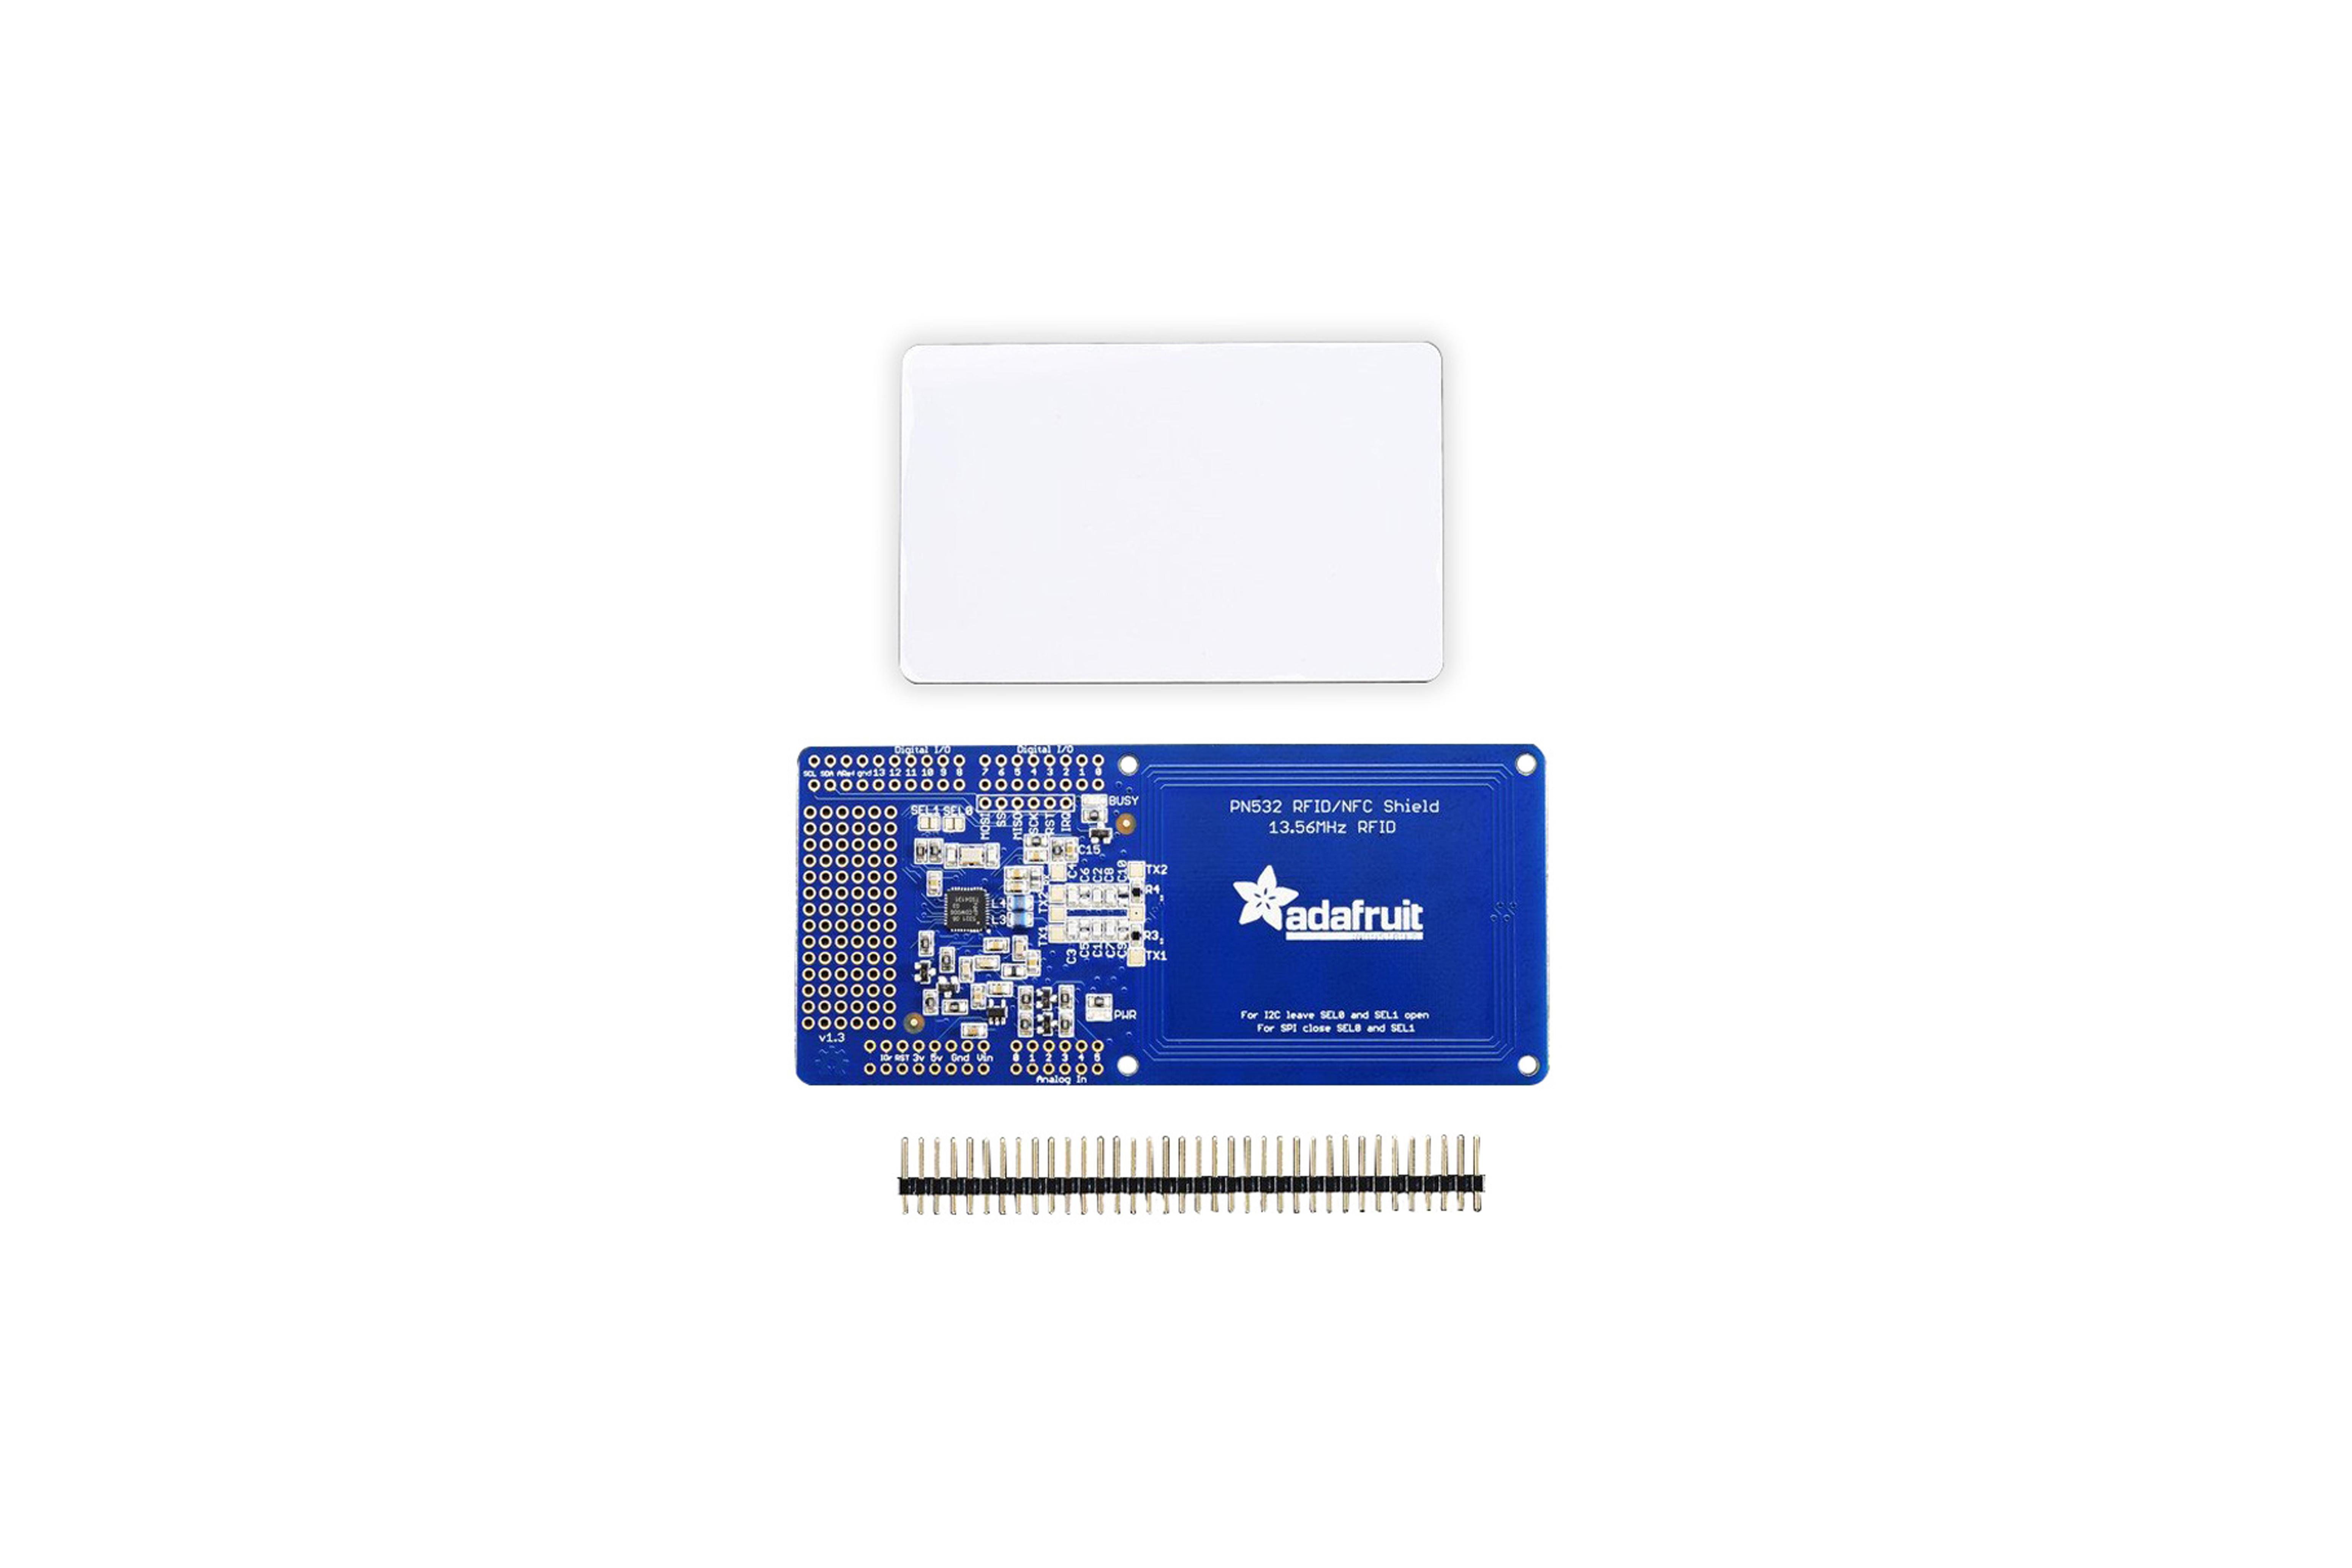 Adafruit PN532 NFC/RFID ControllerShield